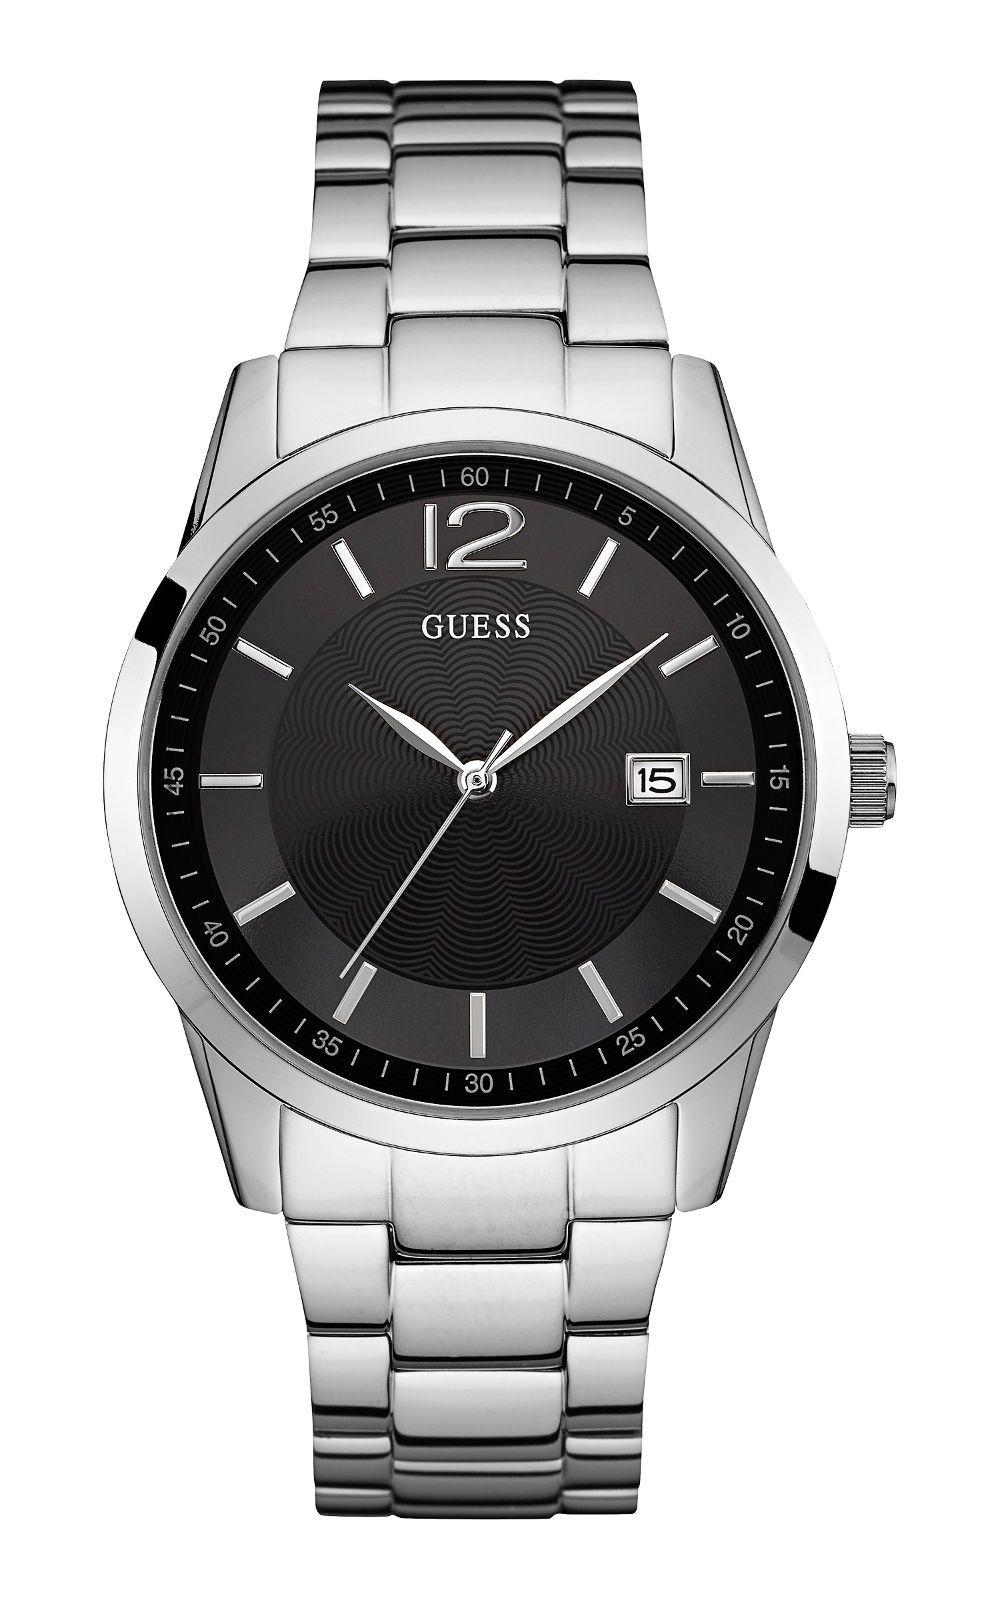 GUESS Stainless Steel Bracelet W0901G1 - Seferos c3907c68c67